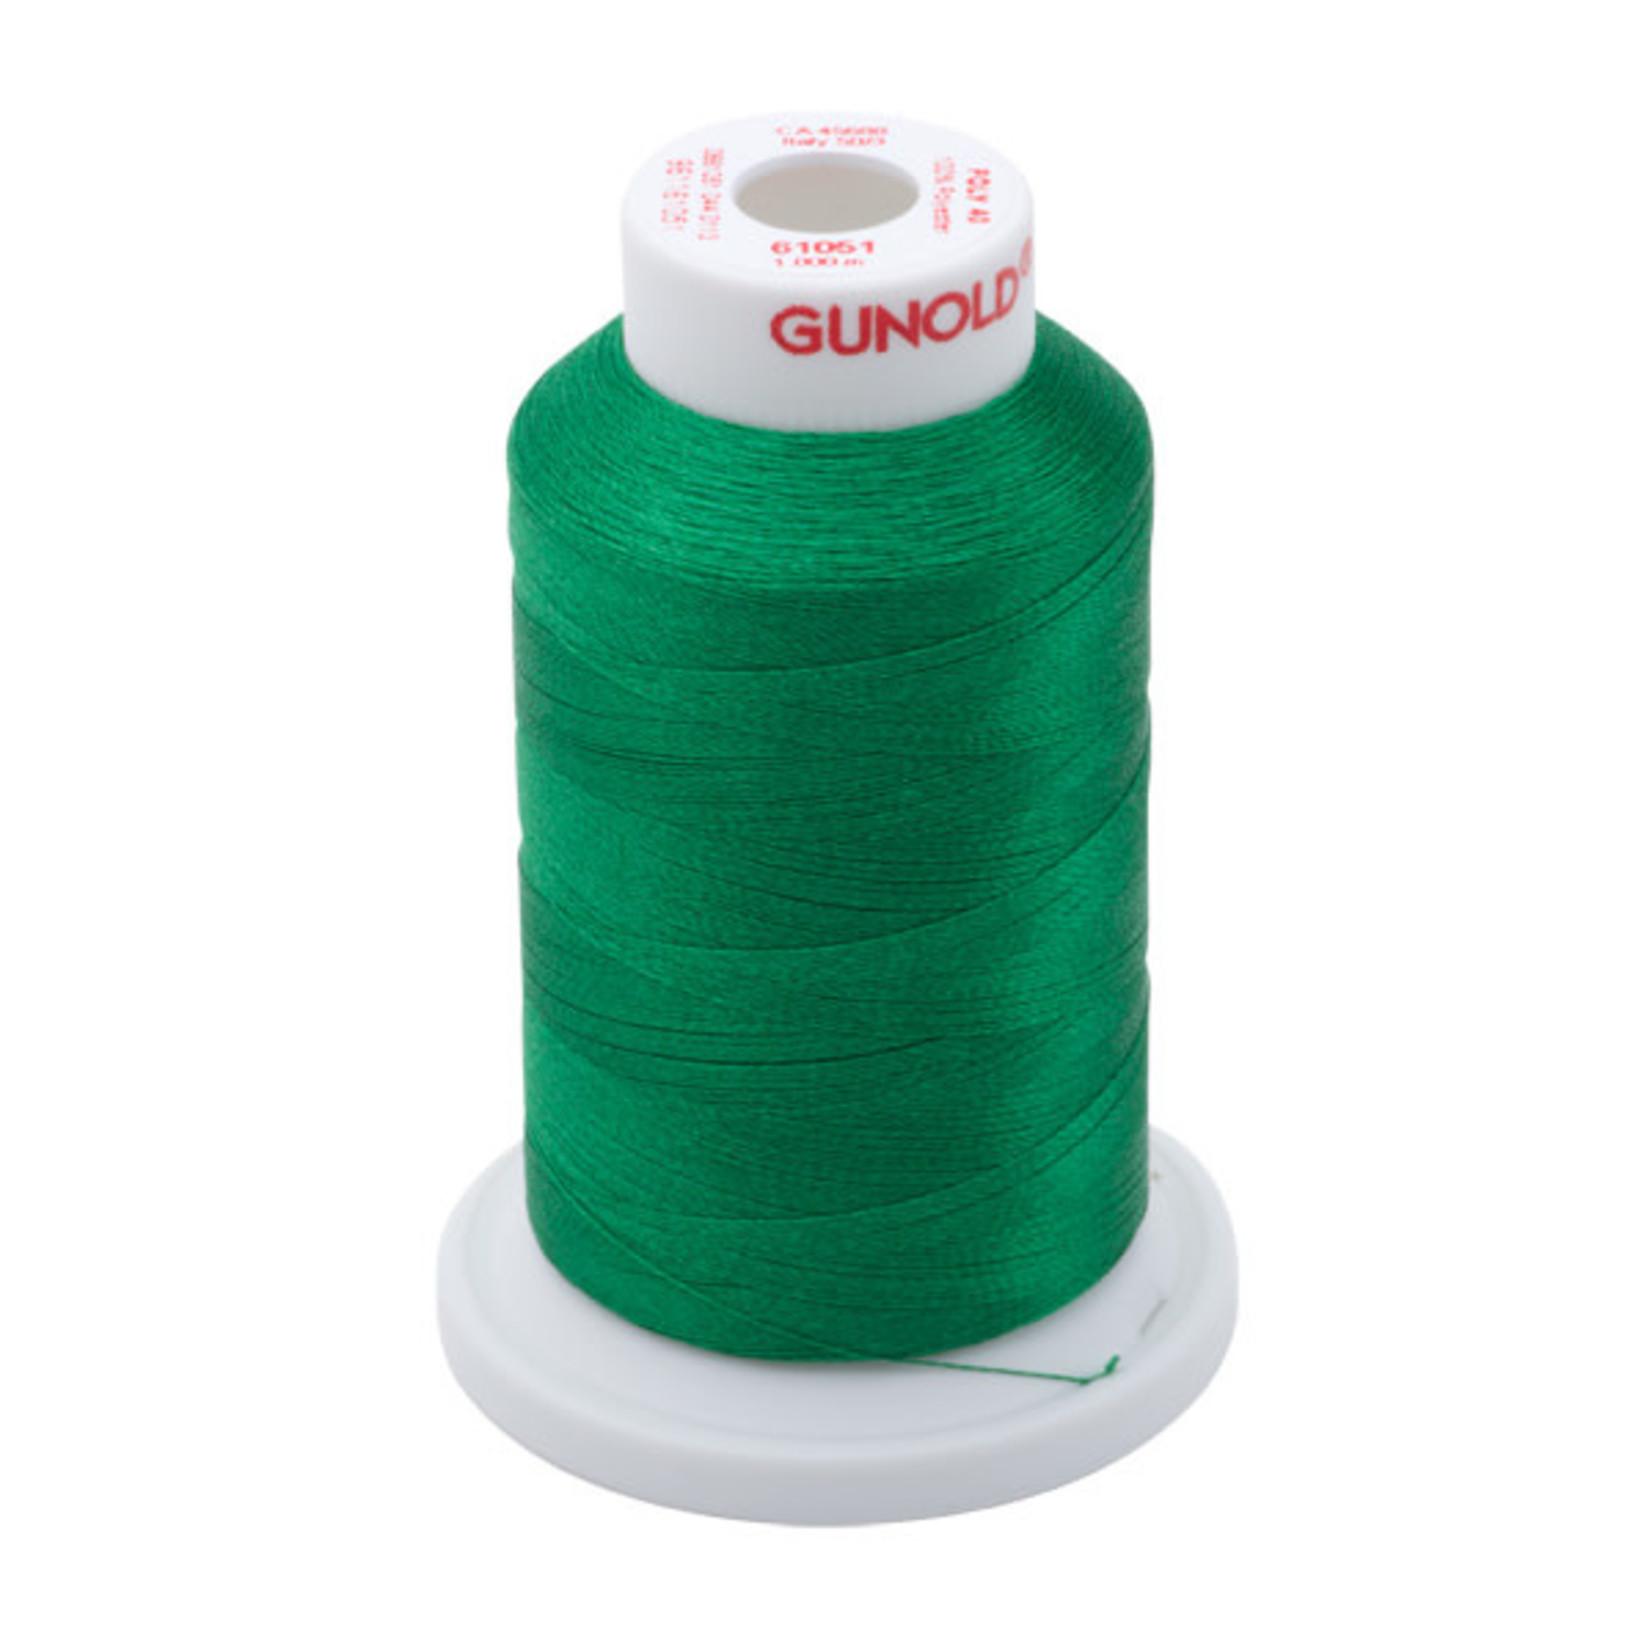 Gunold Poly 40 WT 61051 Christmas Green 1000m